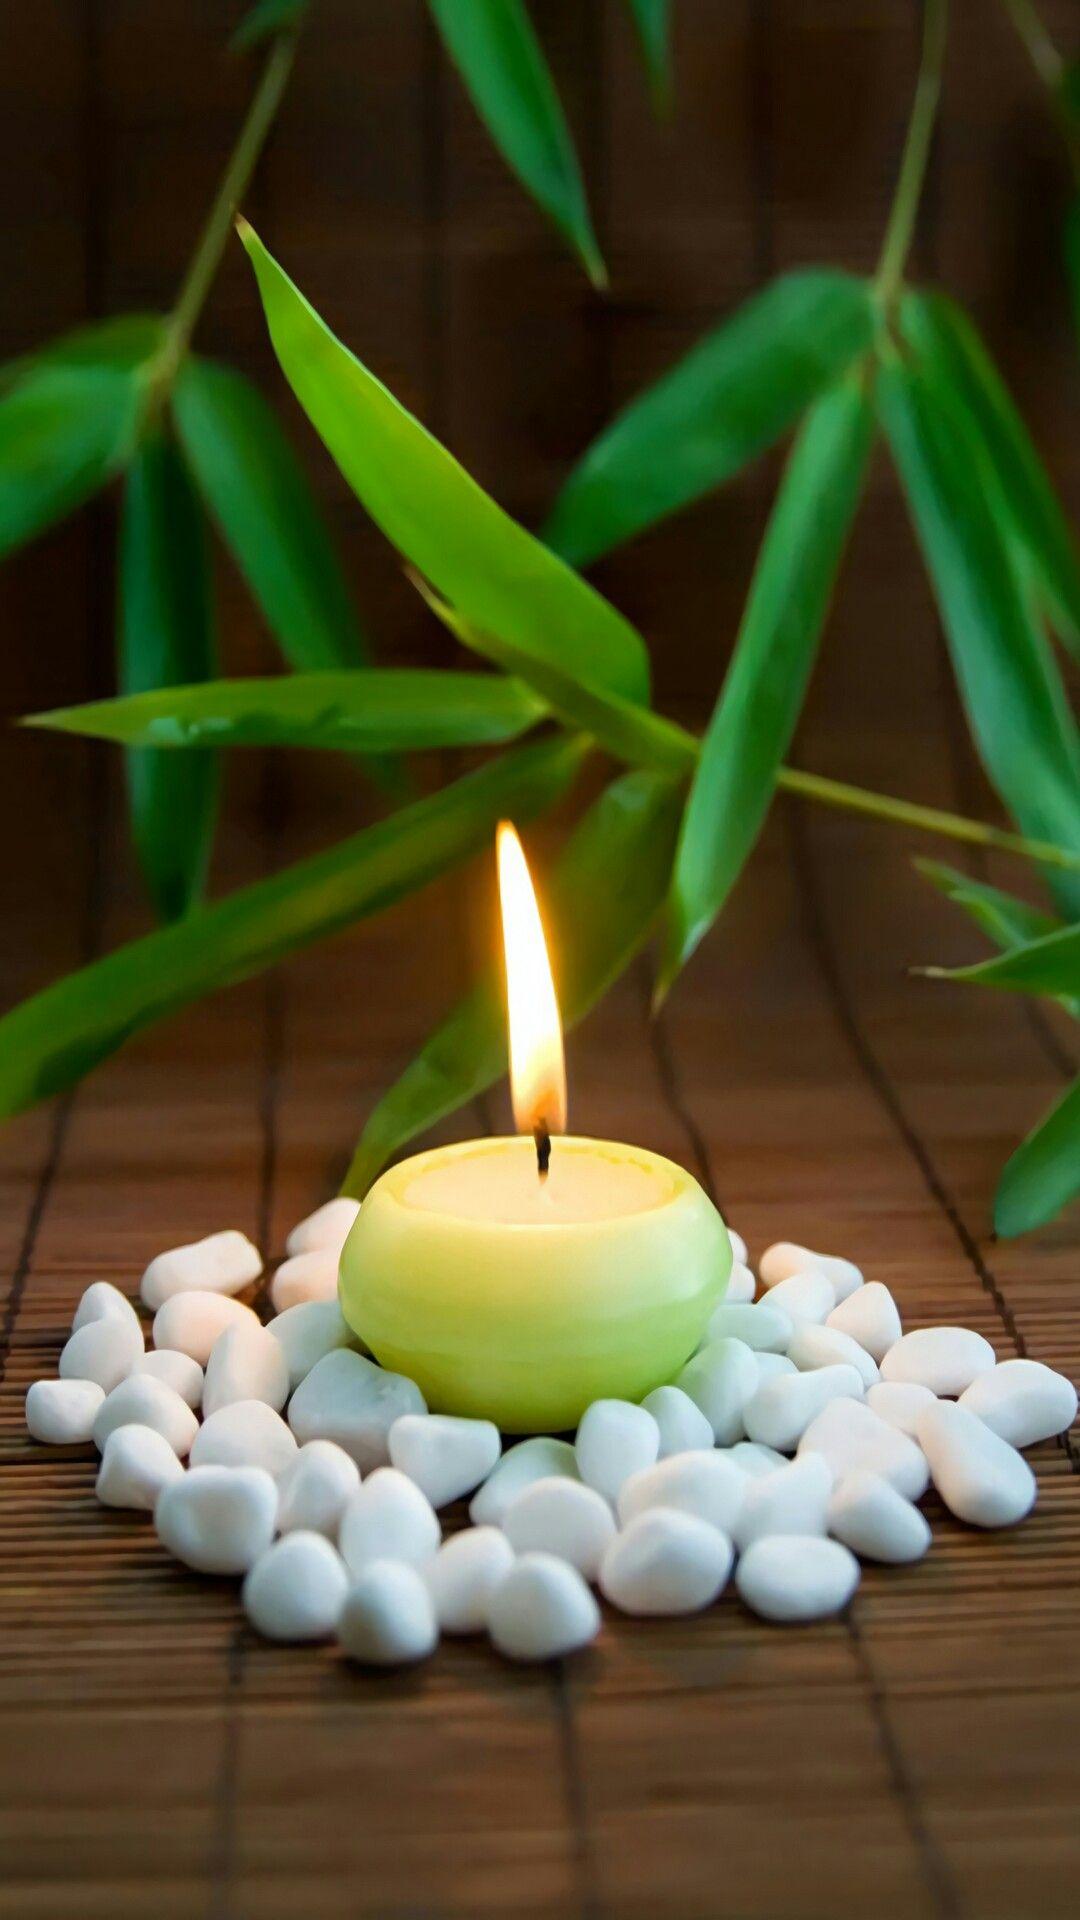 Pin by miranda johnson on candleus pinterest